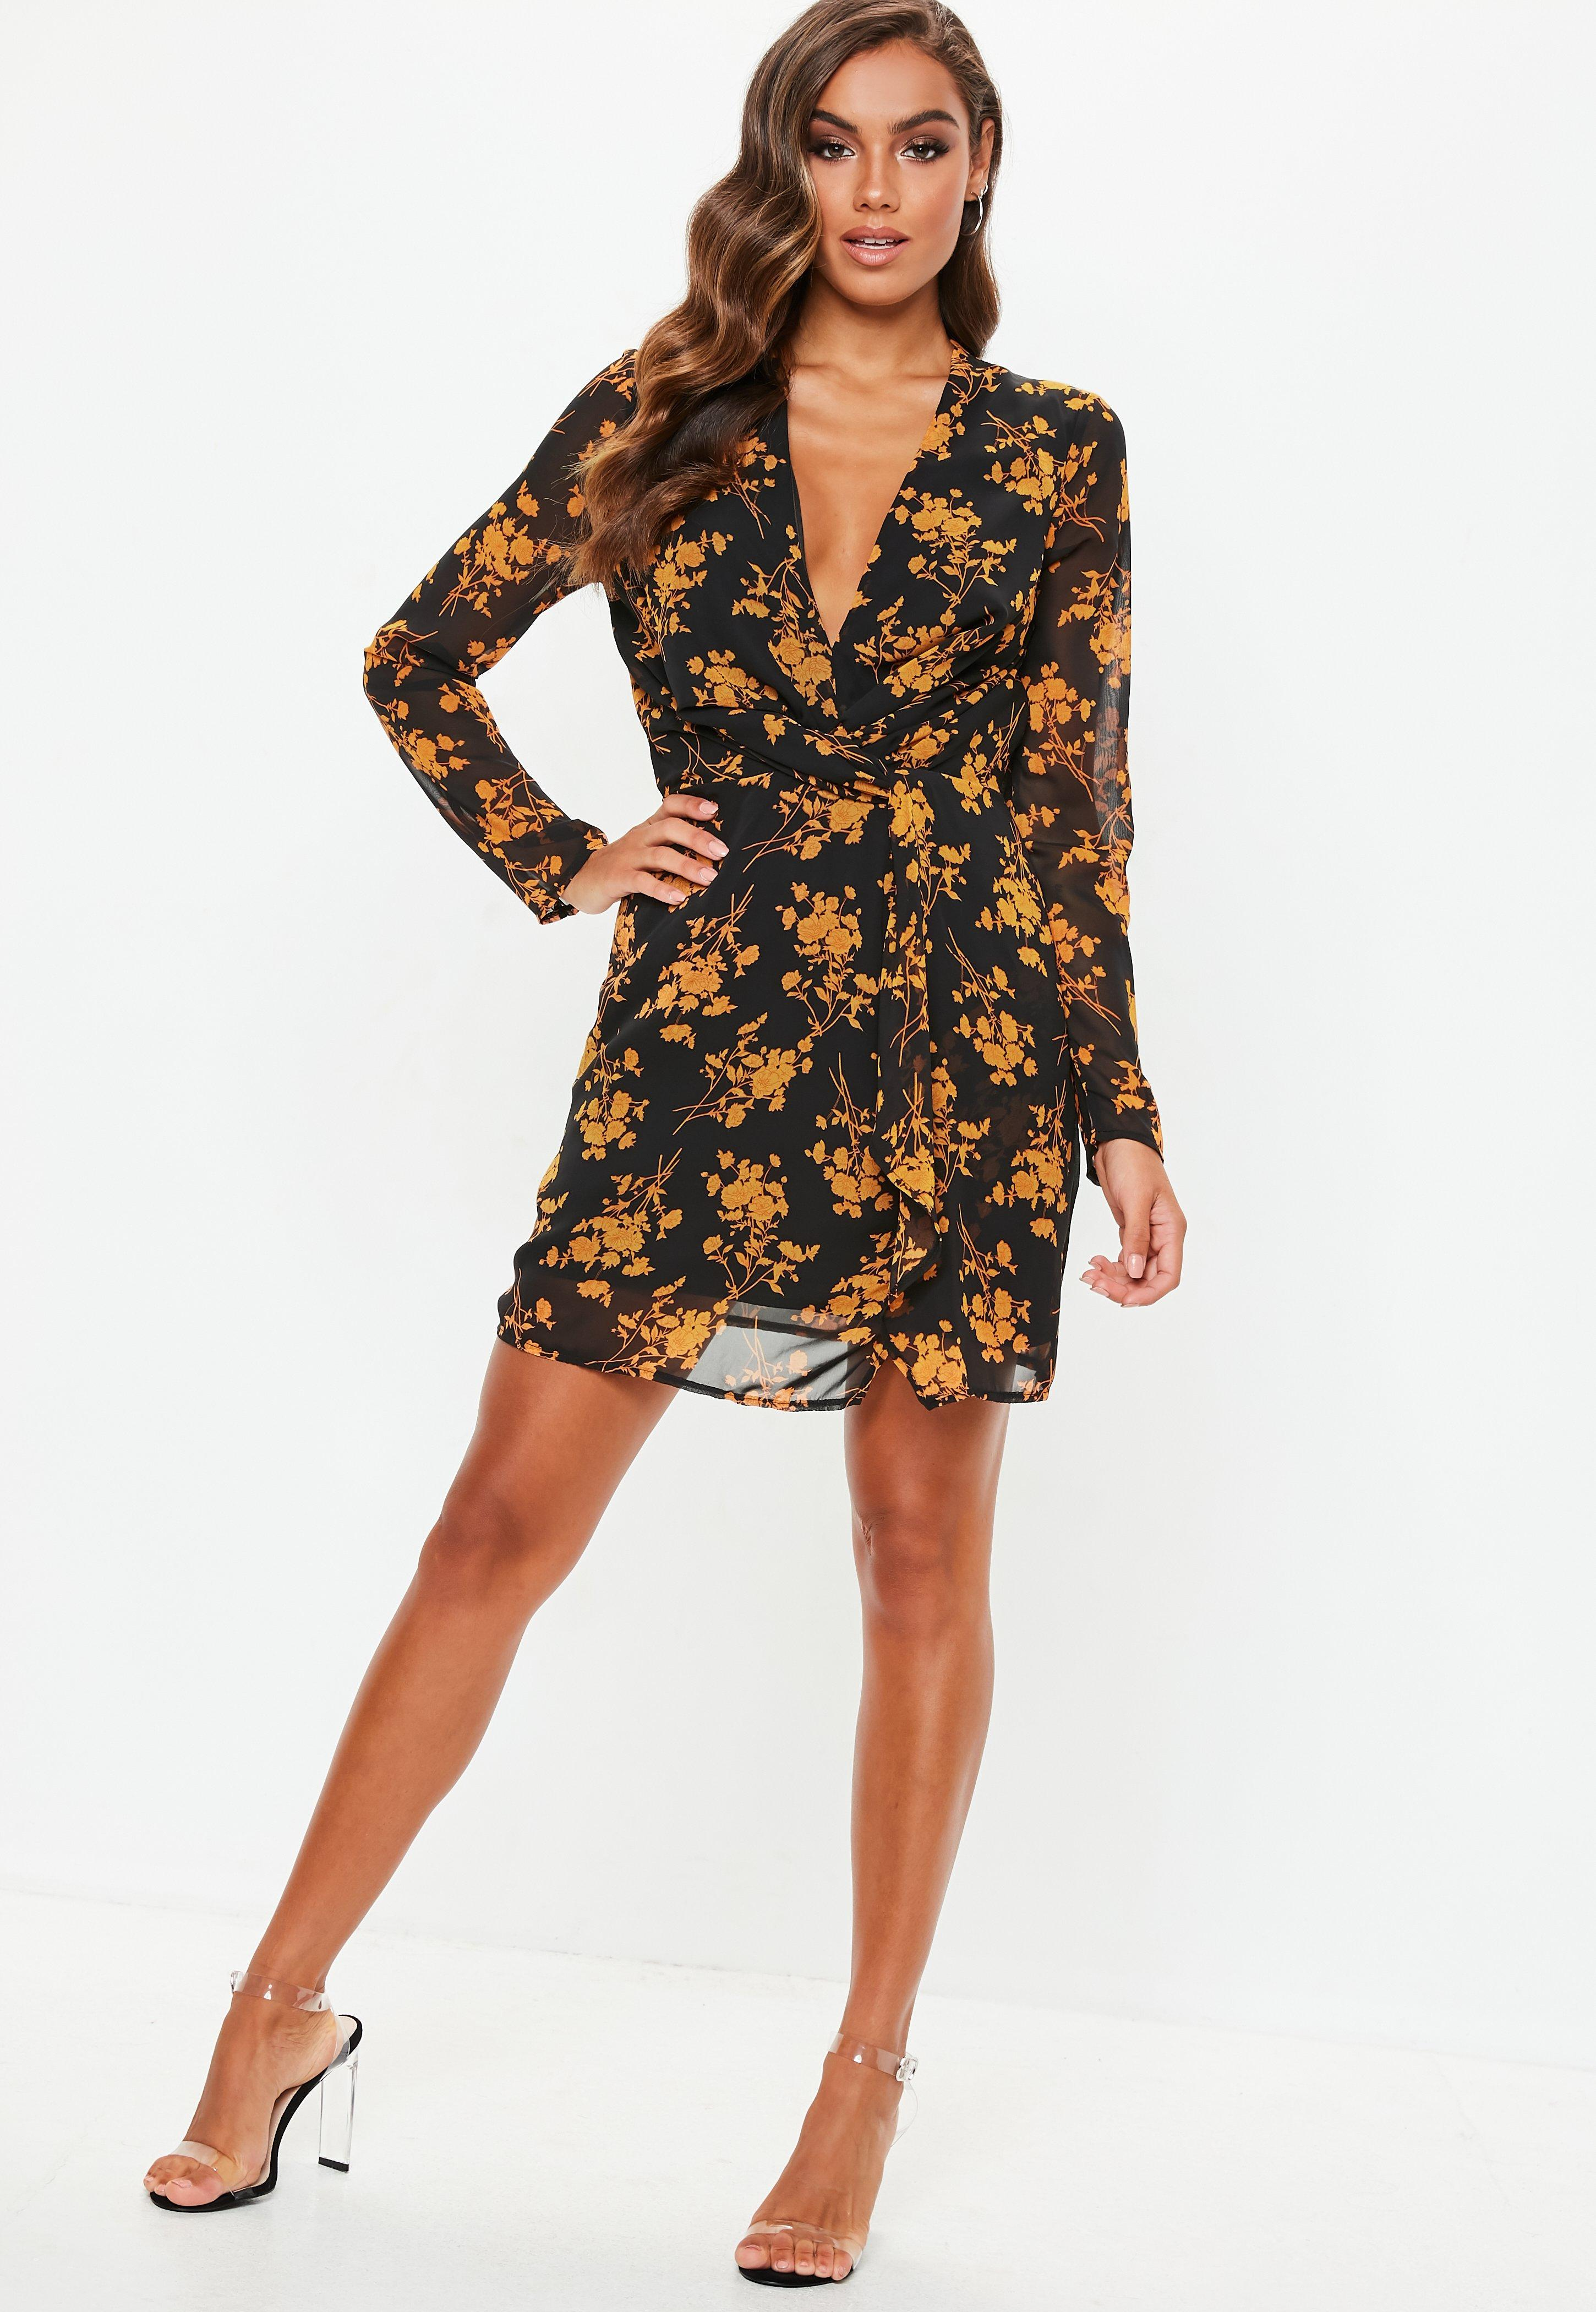 f95486f48eab Lyst - Missguided Tall Black Floral Slinky Plunge Shift Dress in Black